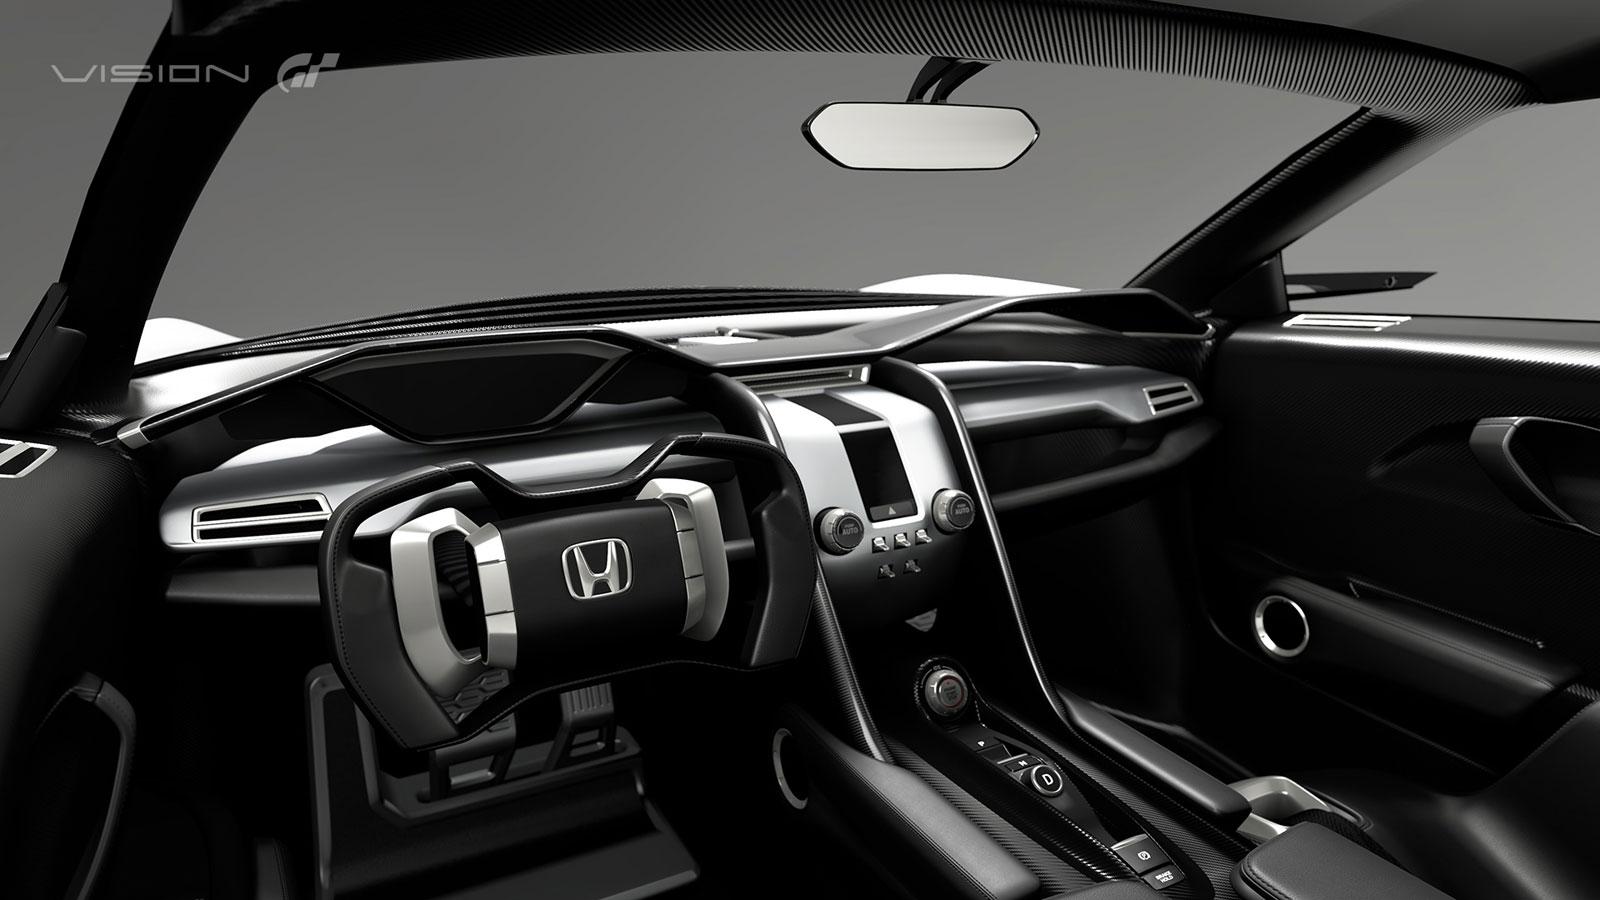 Honda Sports Vision Gran Turismo Concept - Car Body Design